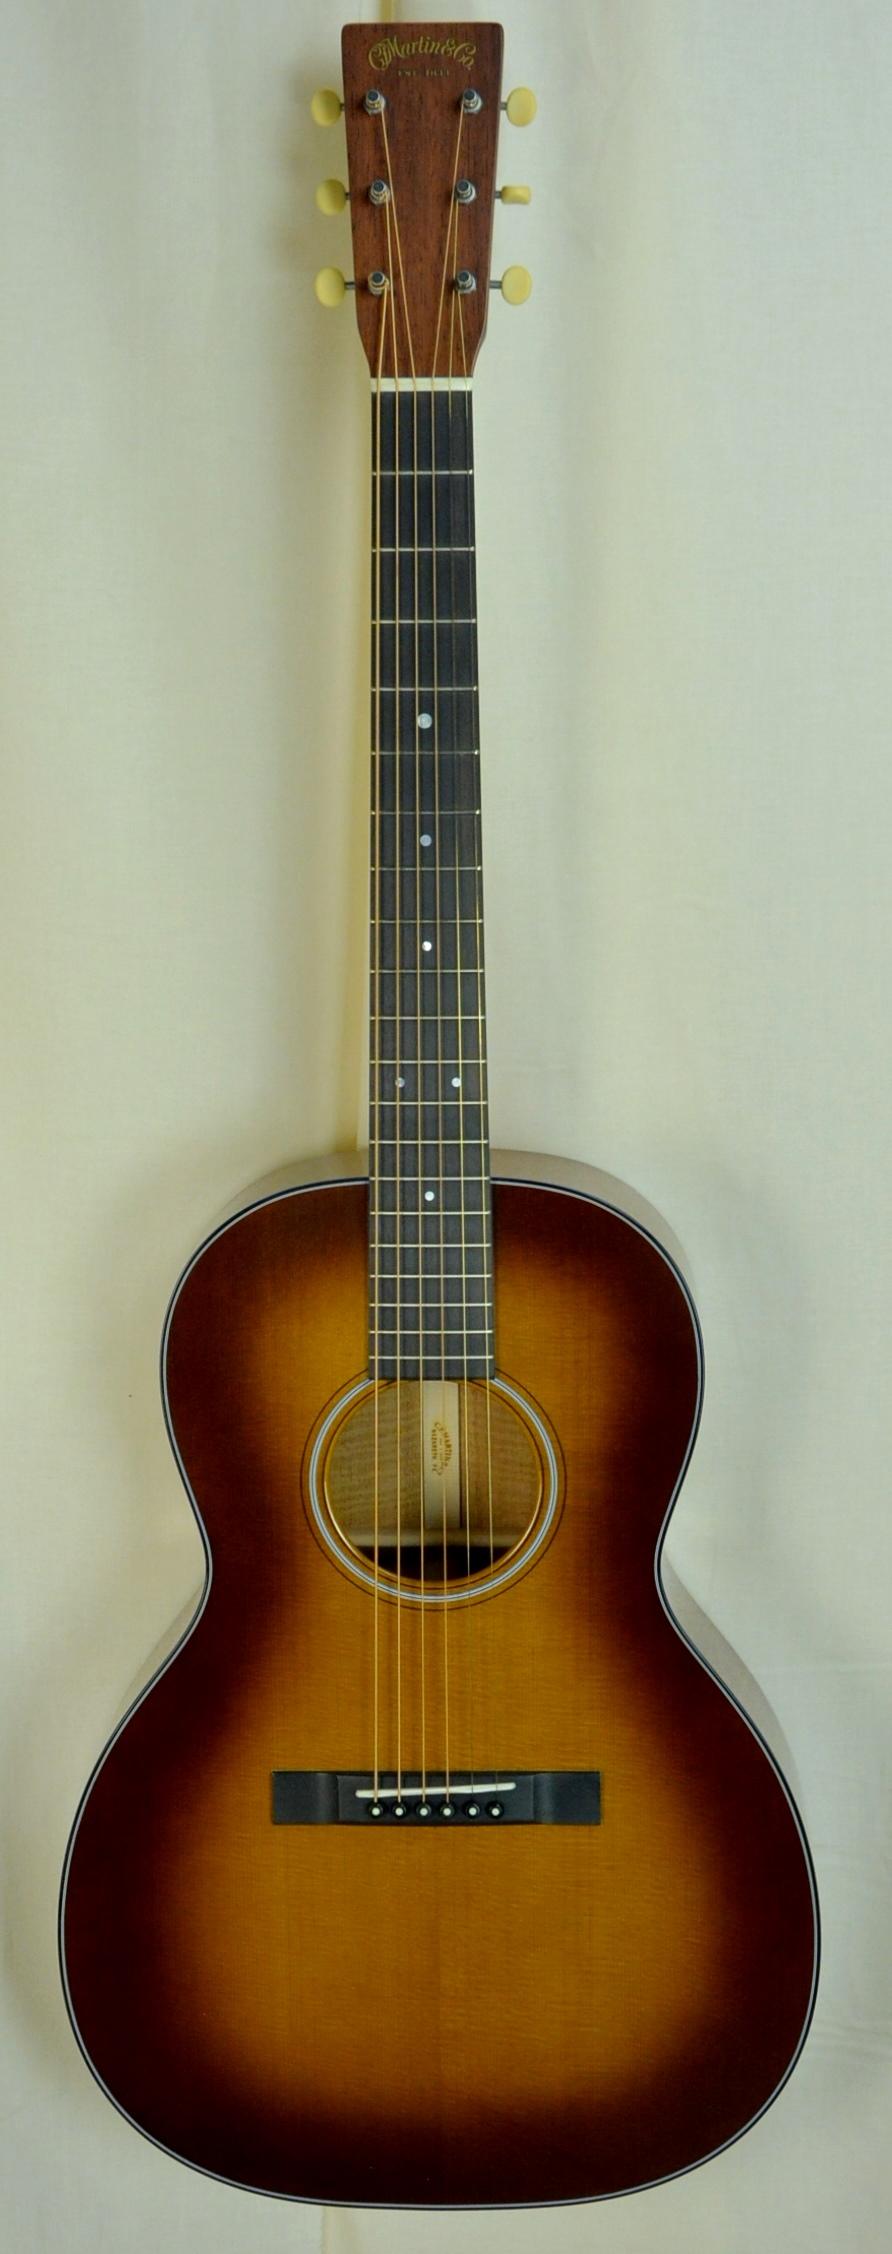 Q-2596824 S-1914897 00-12 Flamed Mahogany Sitka M1 Ambertone (1).JPG